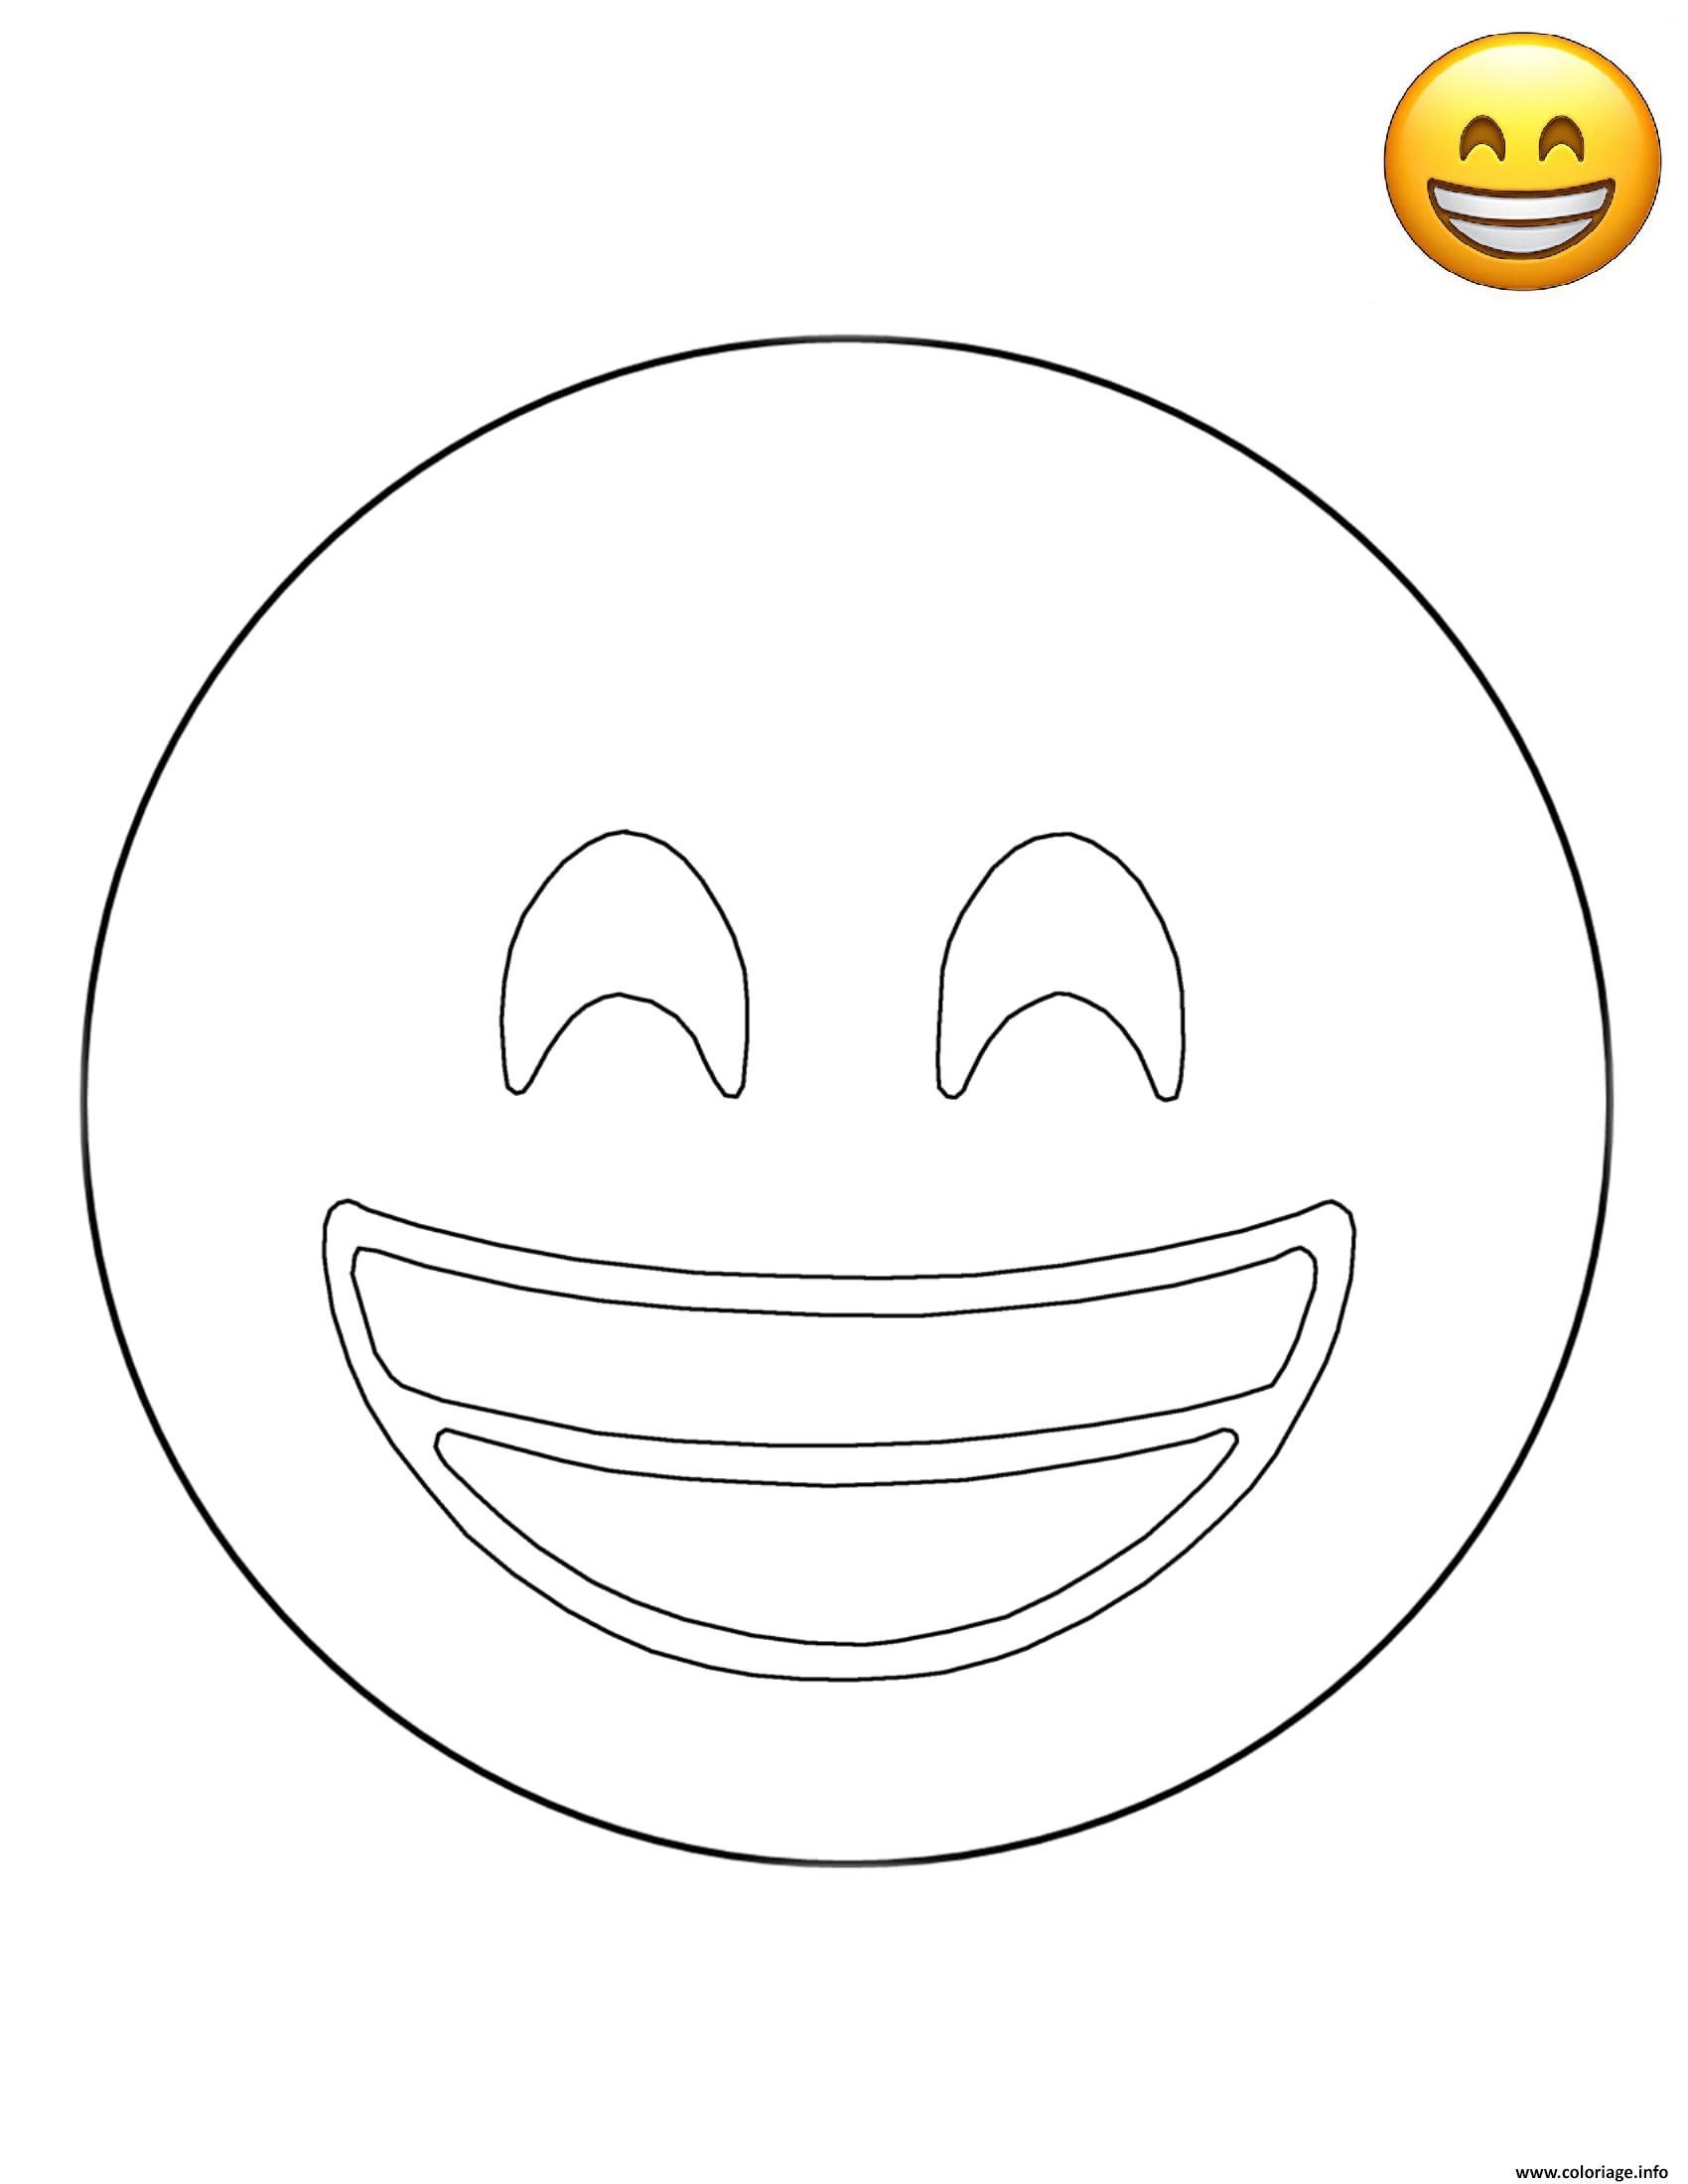 Coloriage emoji grinning smile smiley dessin - Image de smiley a imprimer ...